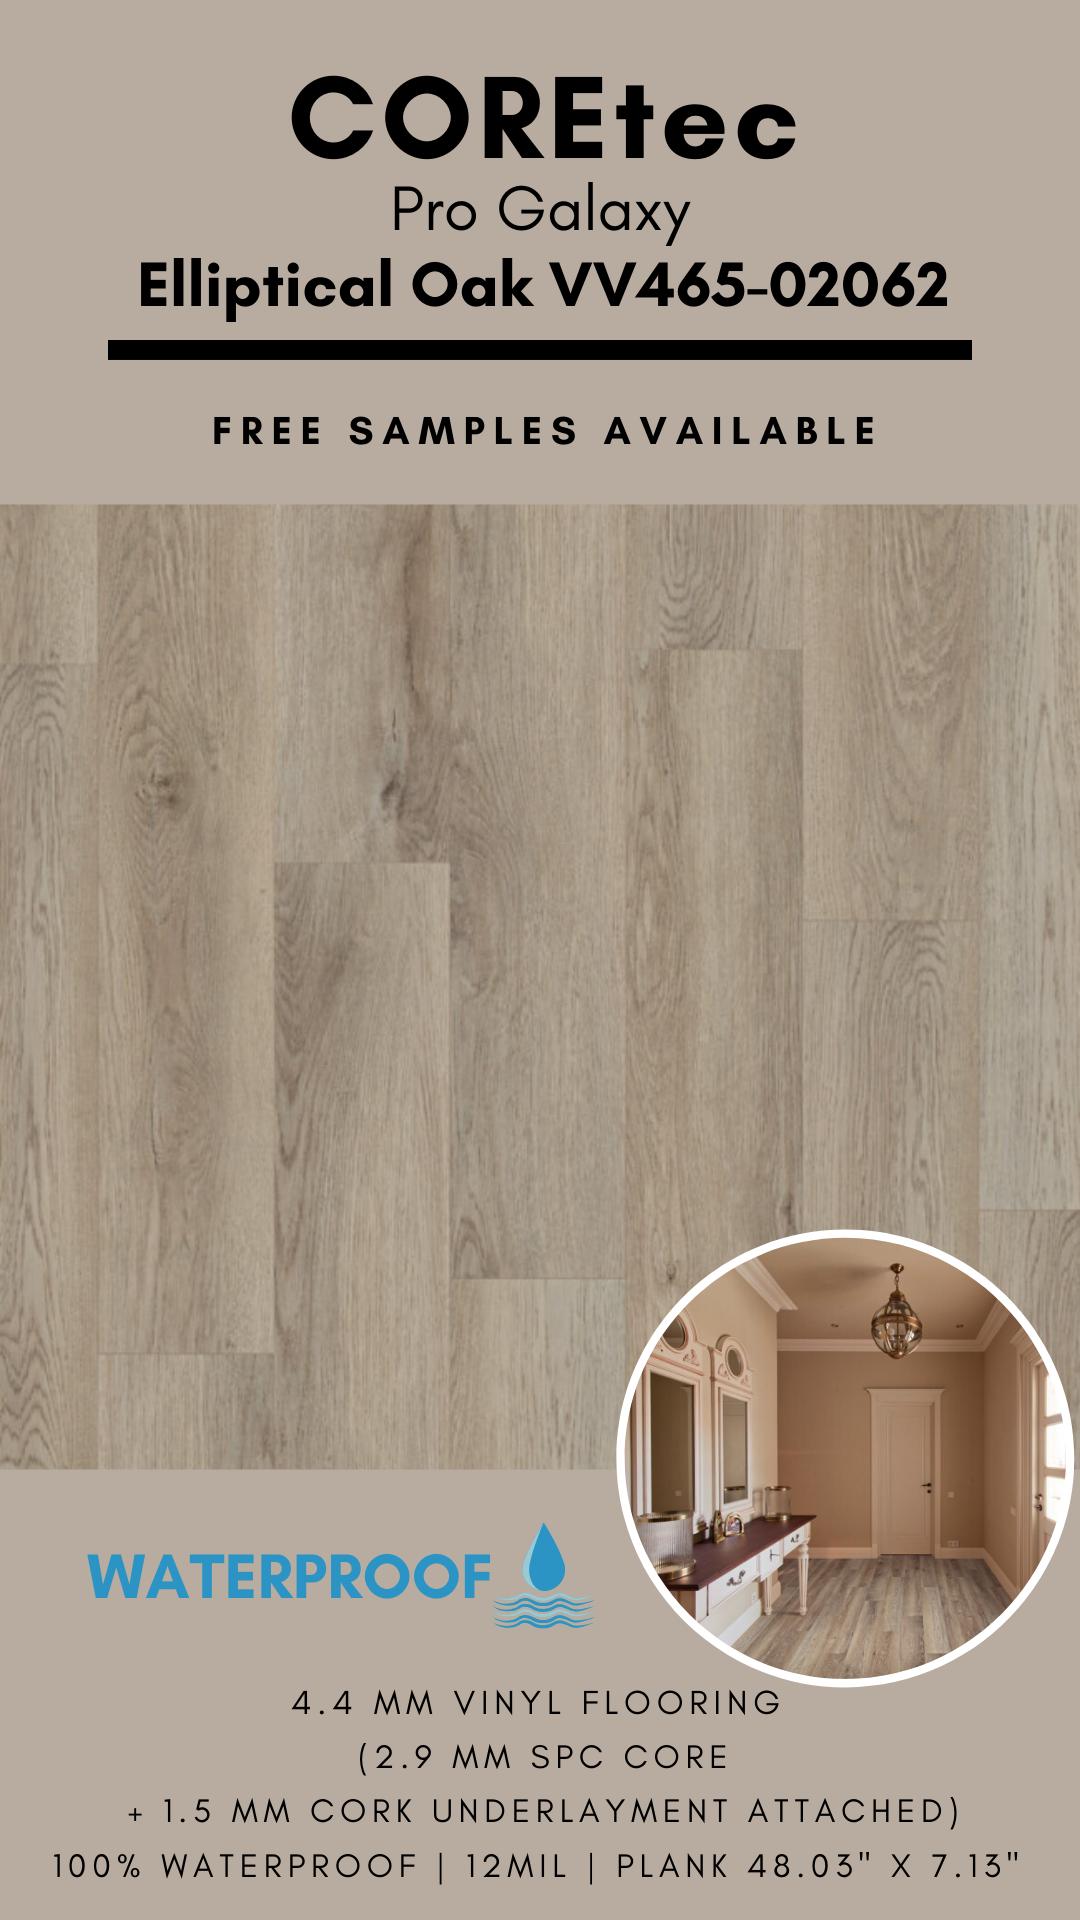 Coretec Pro Galaxy Elliptical Oak Vinyl Flooring In 2020 Vinyl Flooring Flooring Luxury Vinyl Flooring